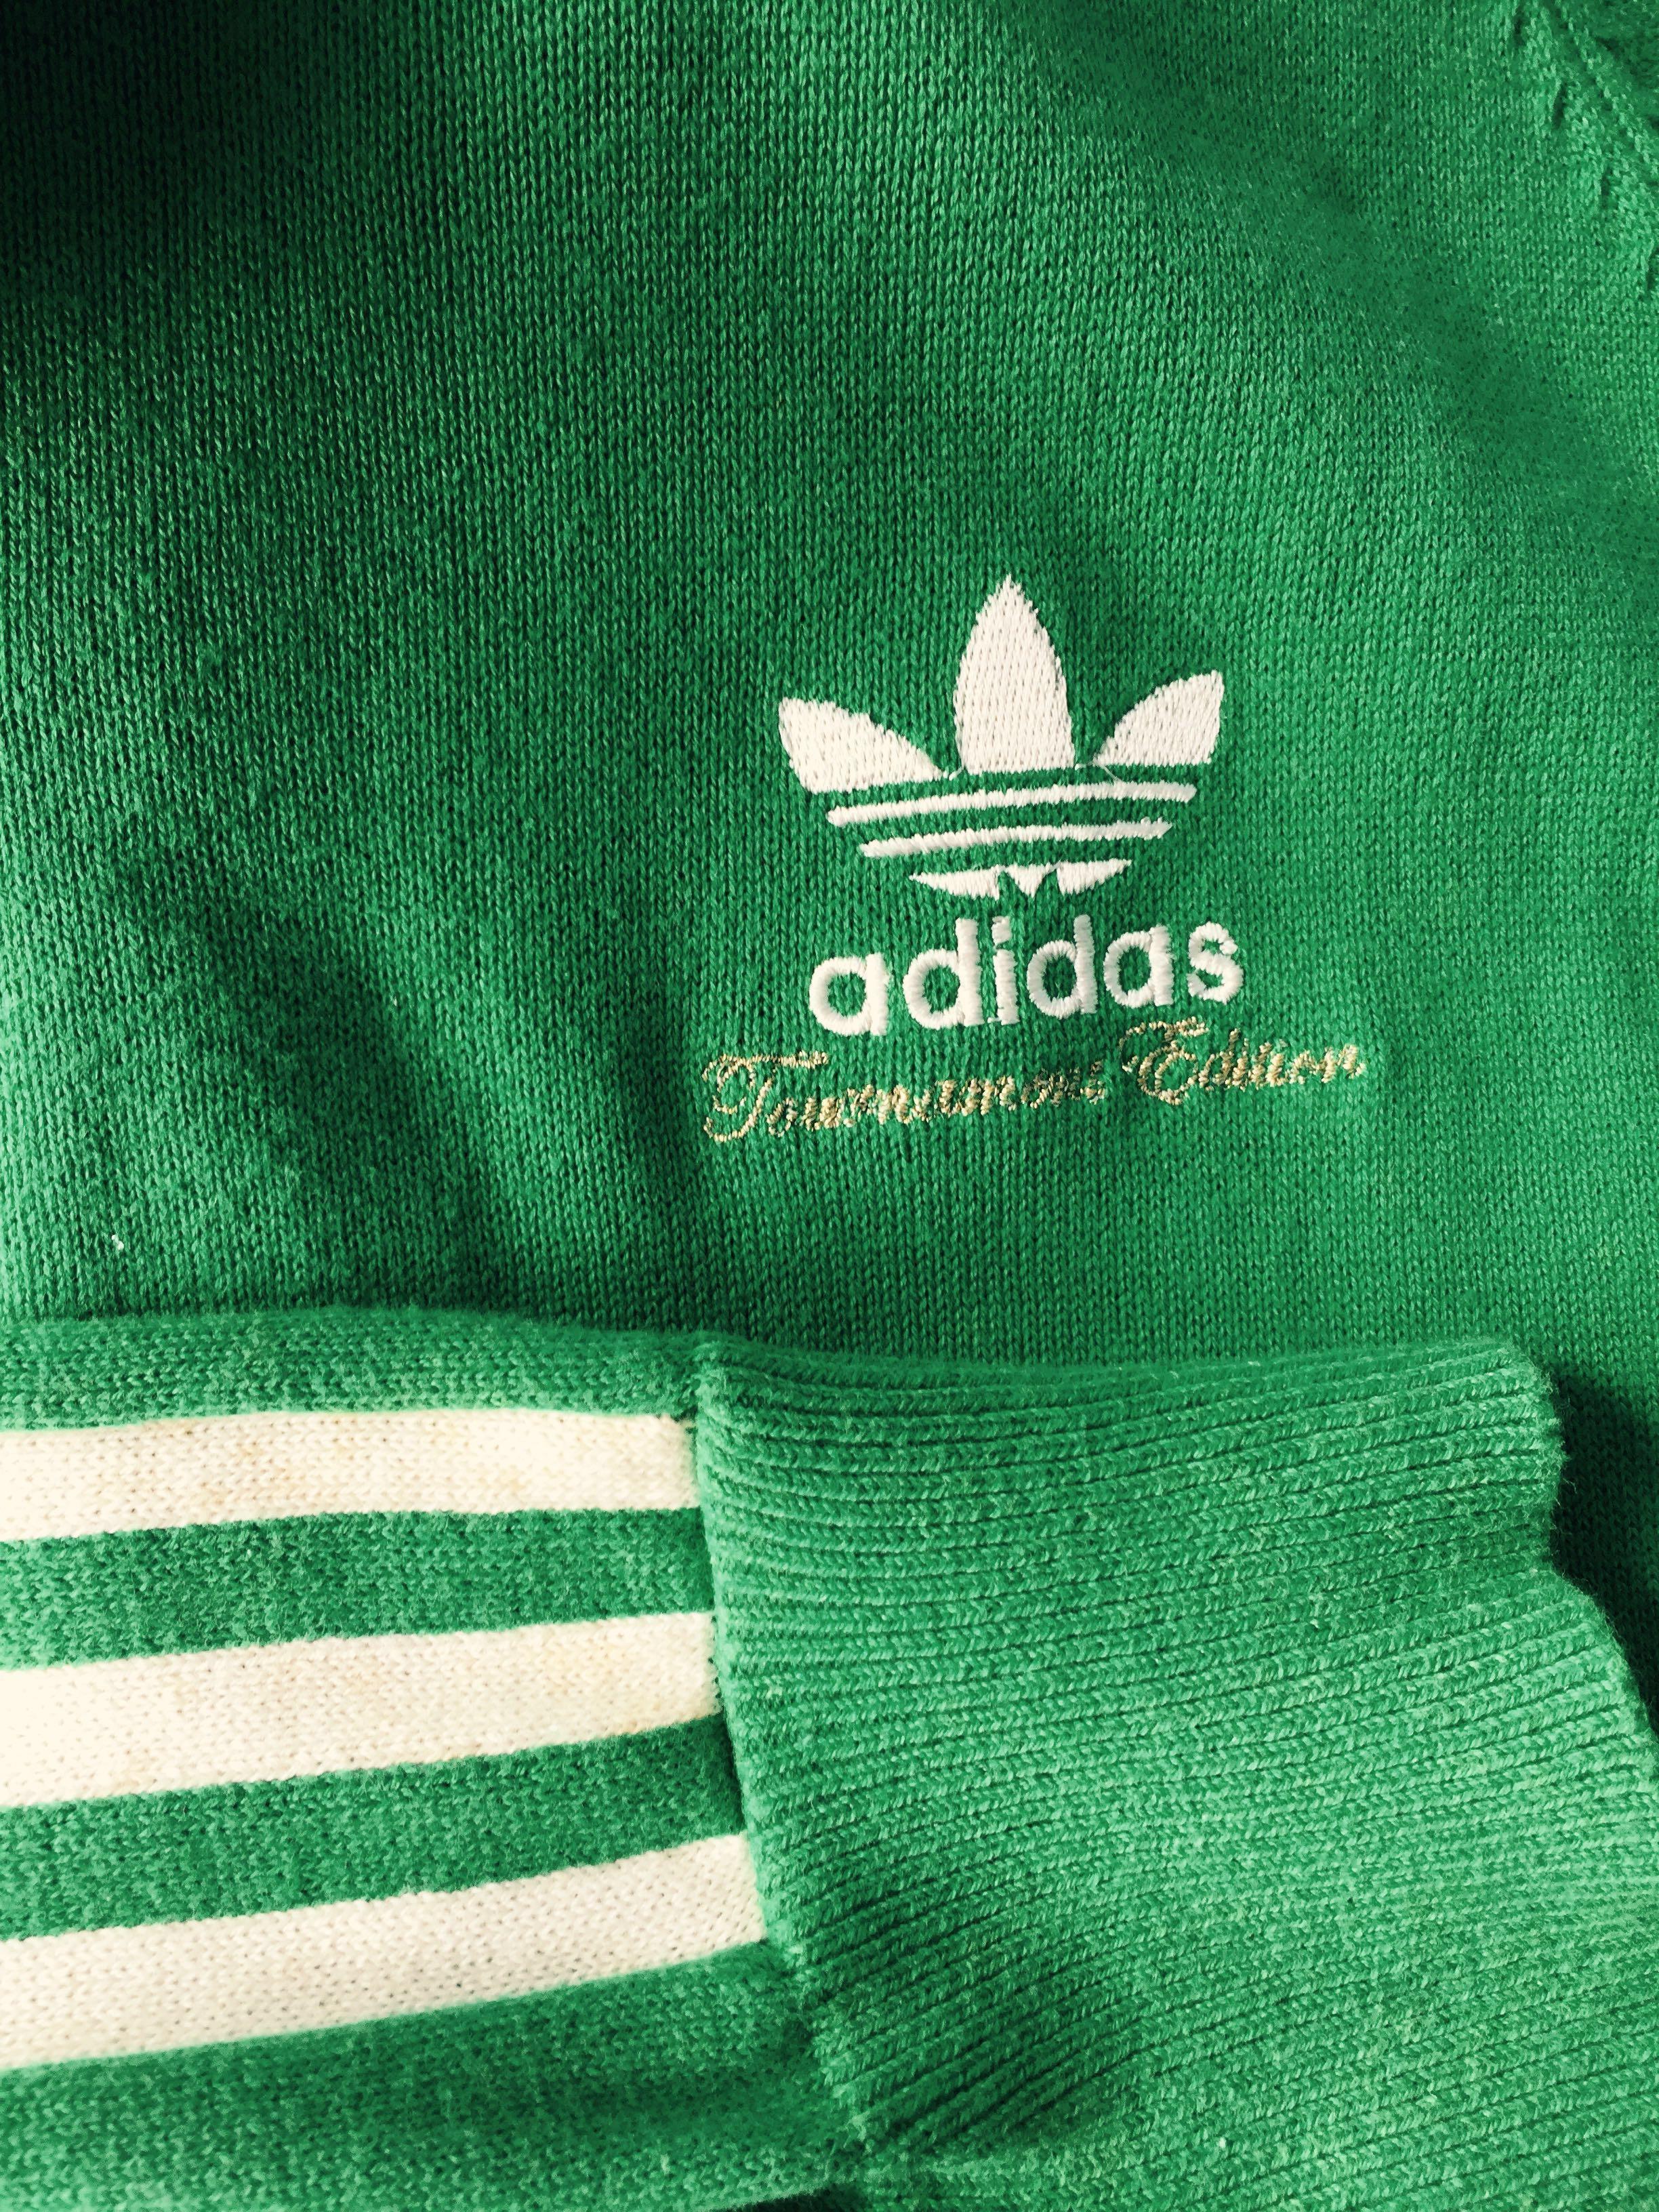 Vintage Adidas Originals Tournament Edition 1949 Jacket